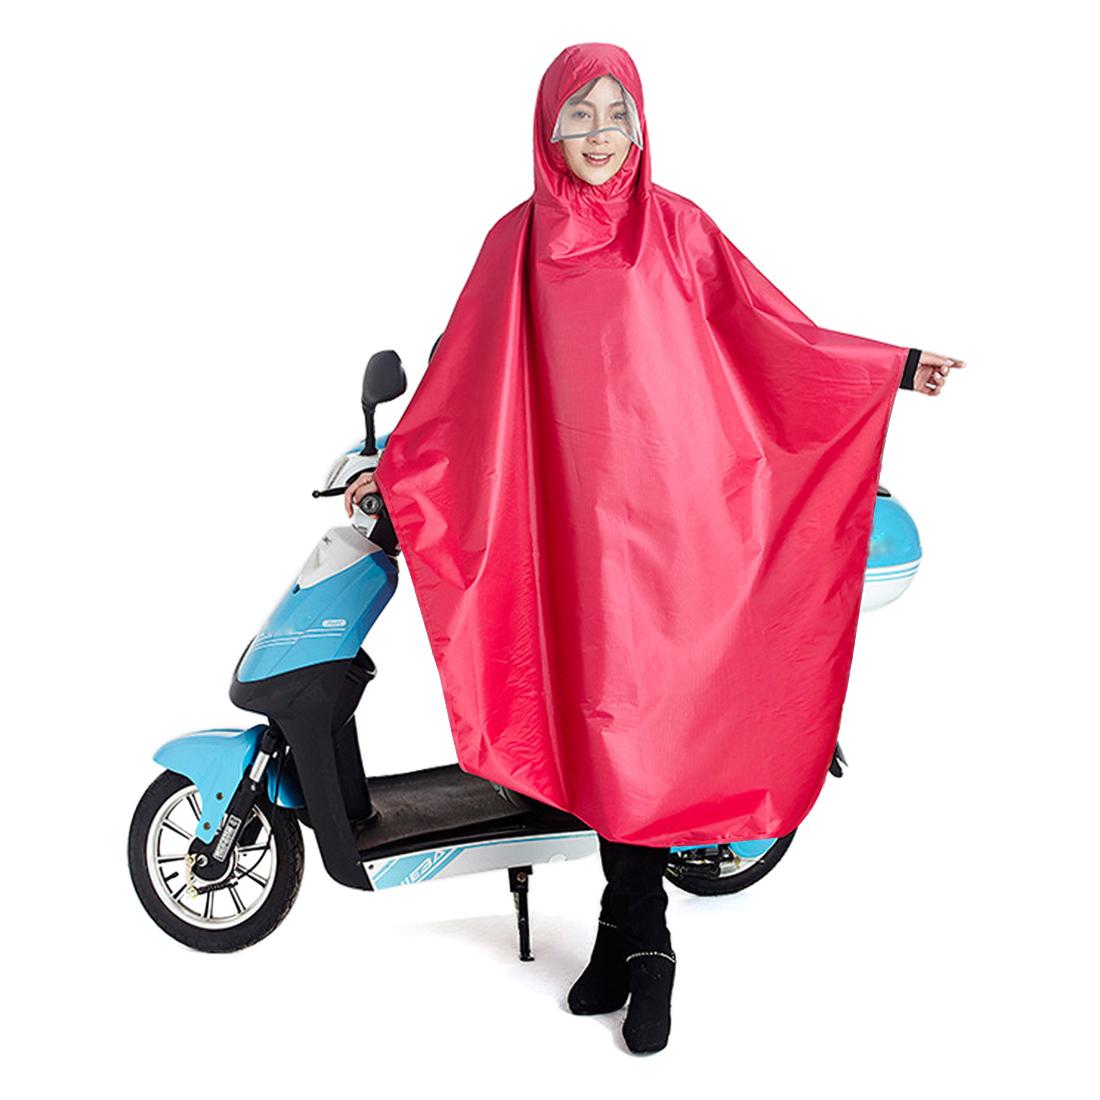 Pink Adult Poncho Cycling Raincoat Bicycle Hooded Waterproof Rain Coat Cover